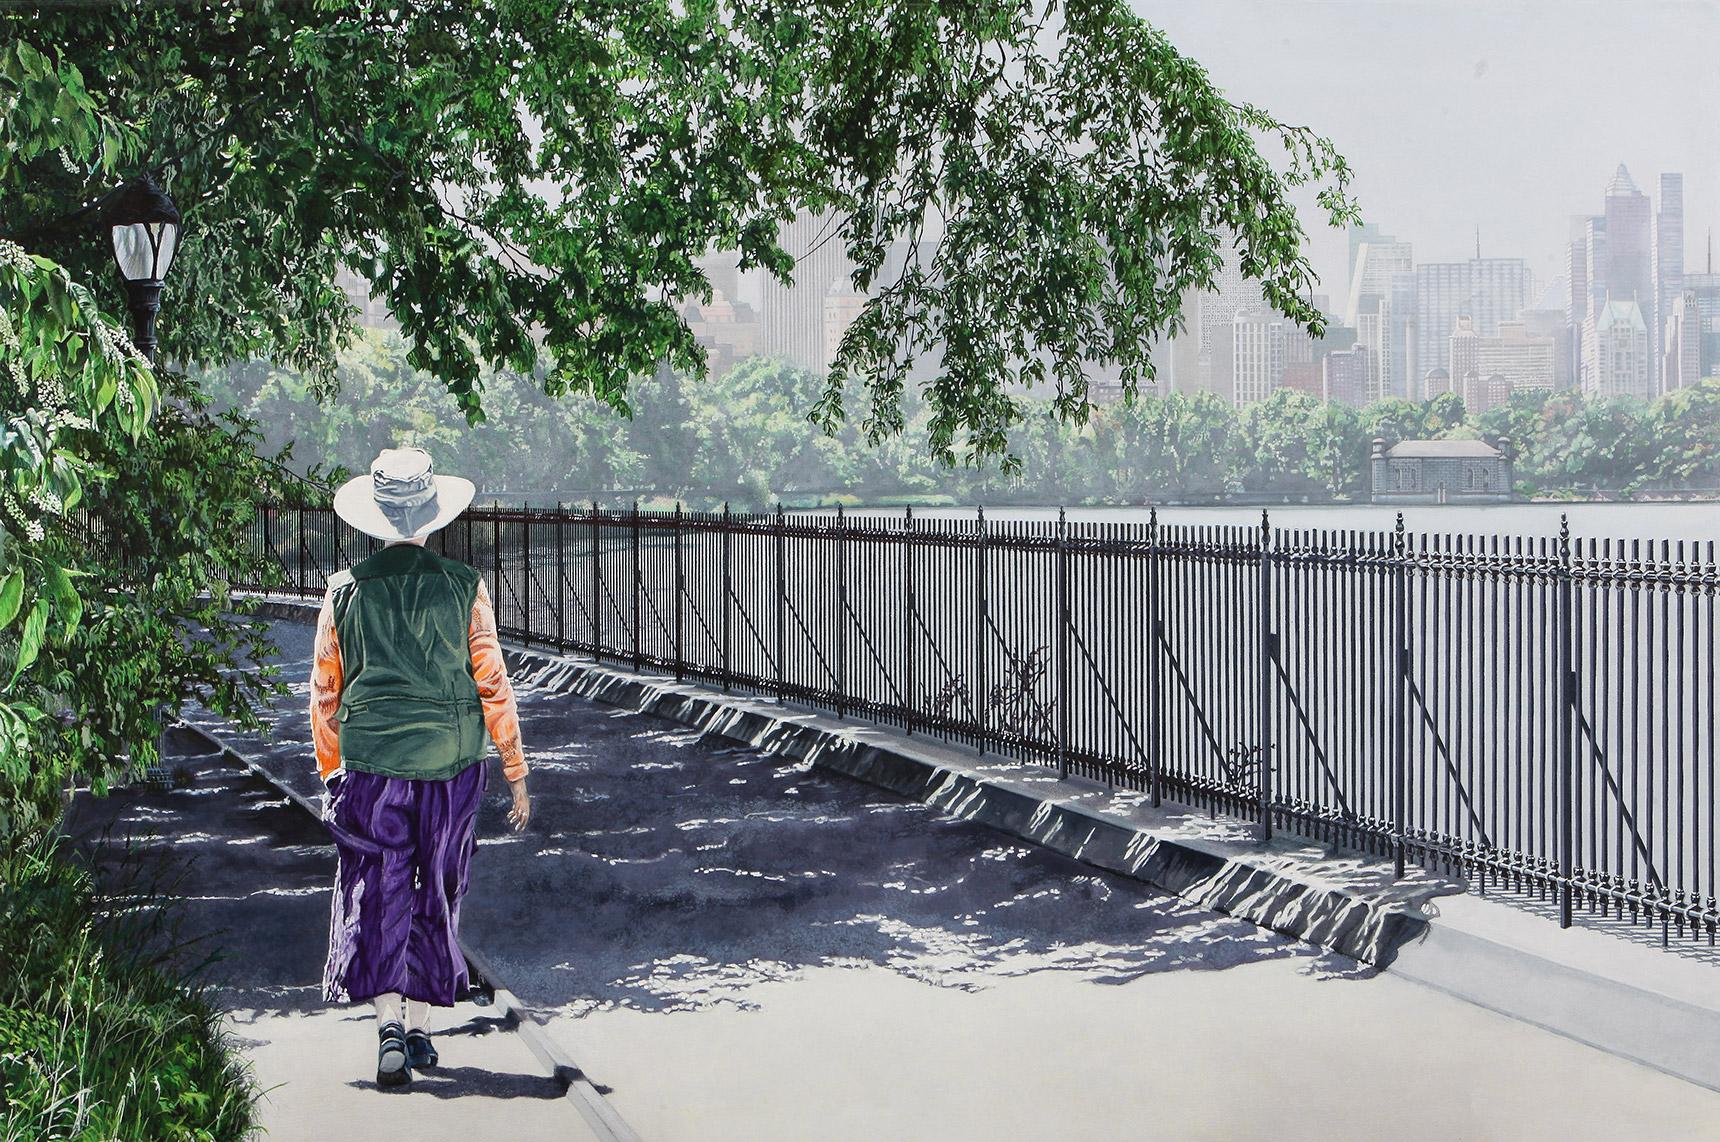 Peinture hyperréalisme Hervé Bernard : Jusqu'à la rive